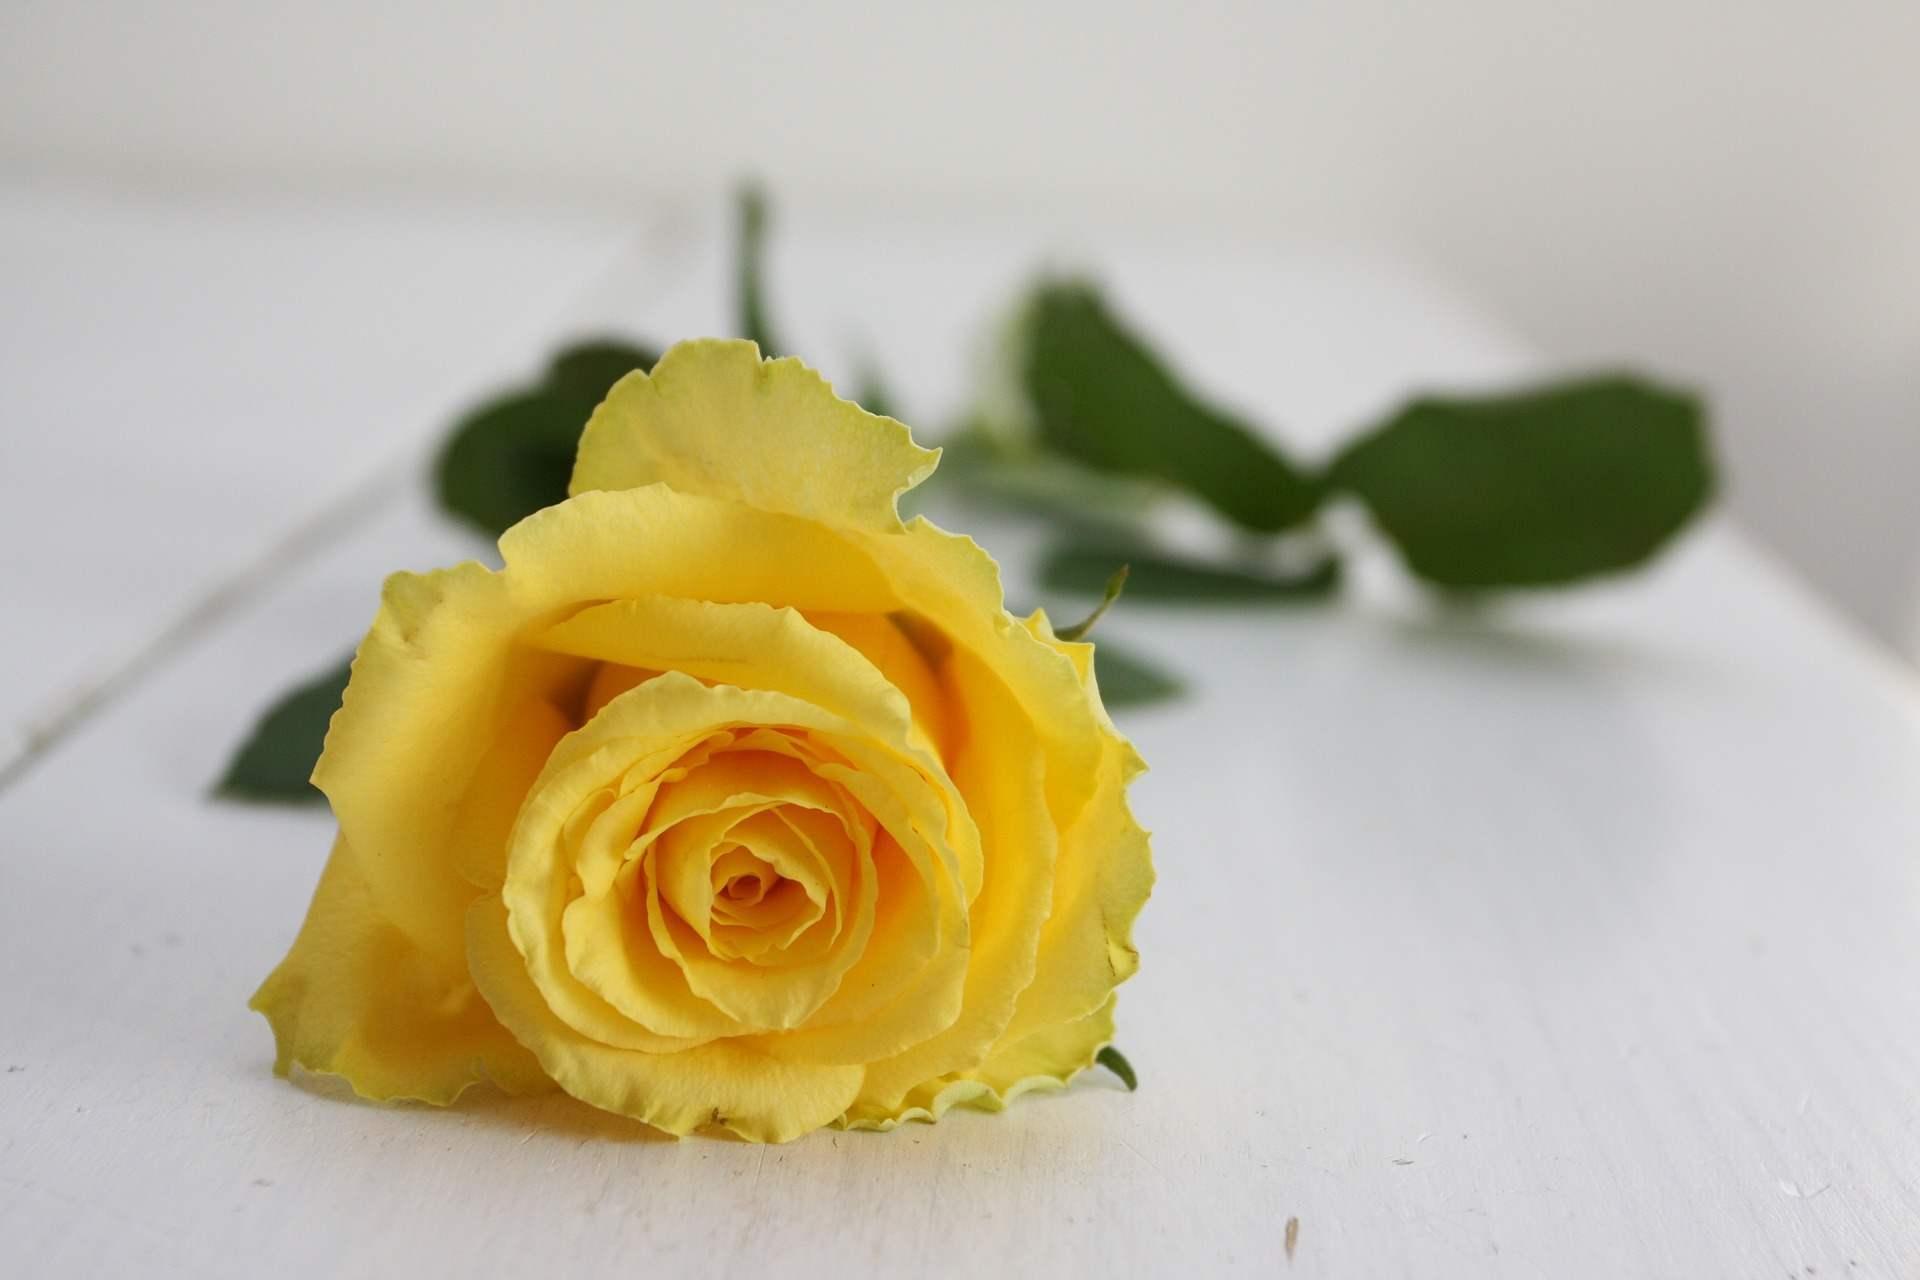 Buchetele de trandafiri galbeni - optimism si vitalitate